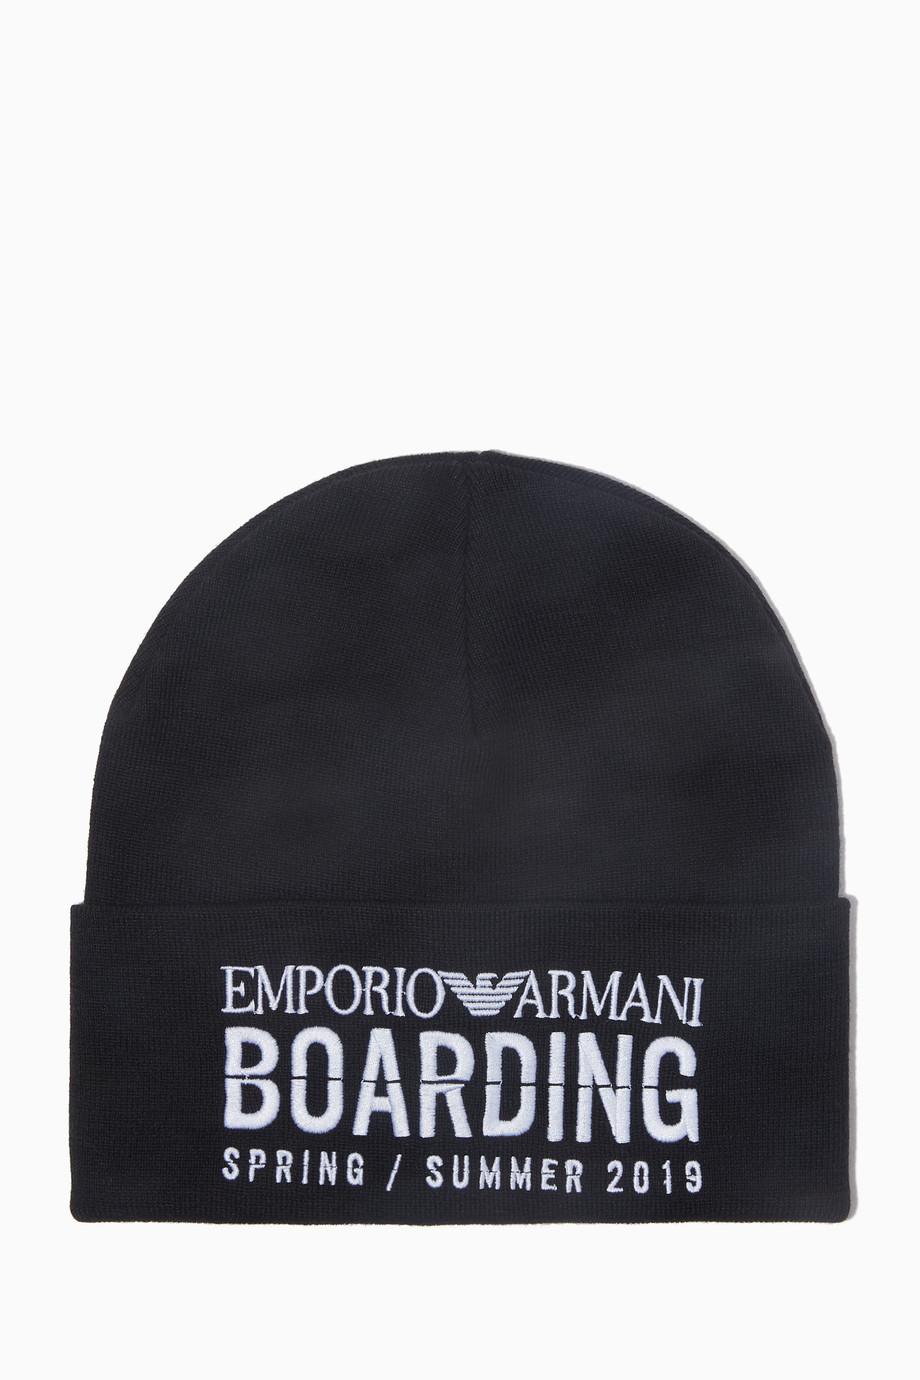 8b65951d191 Shop Emporio Armani Black Black Boarding Logo Beanie Hat for Men ...